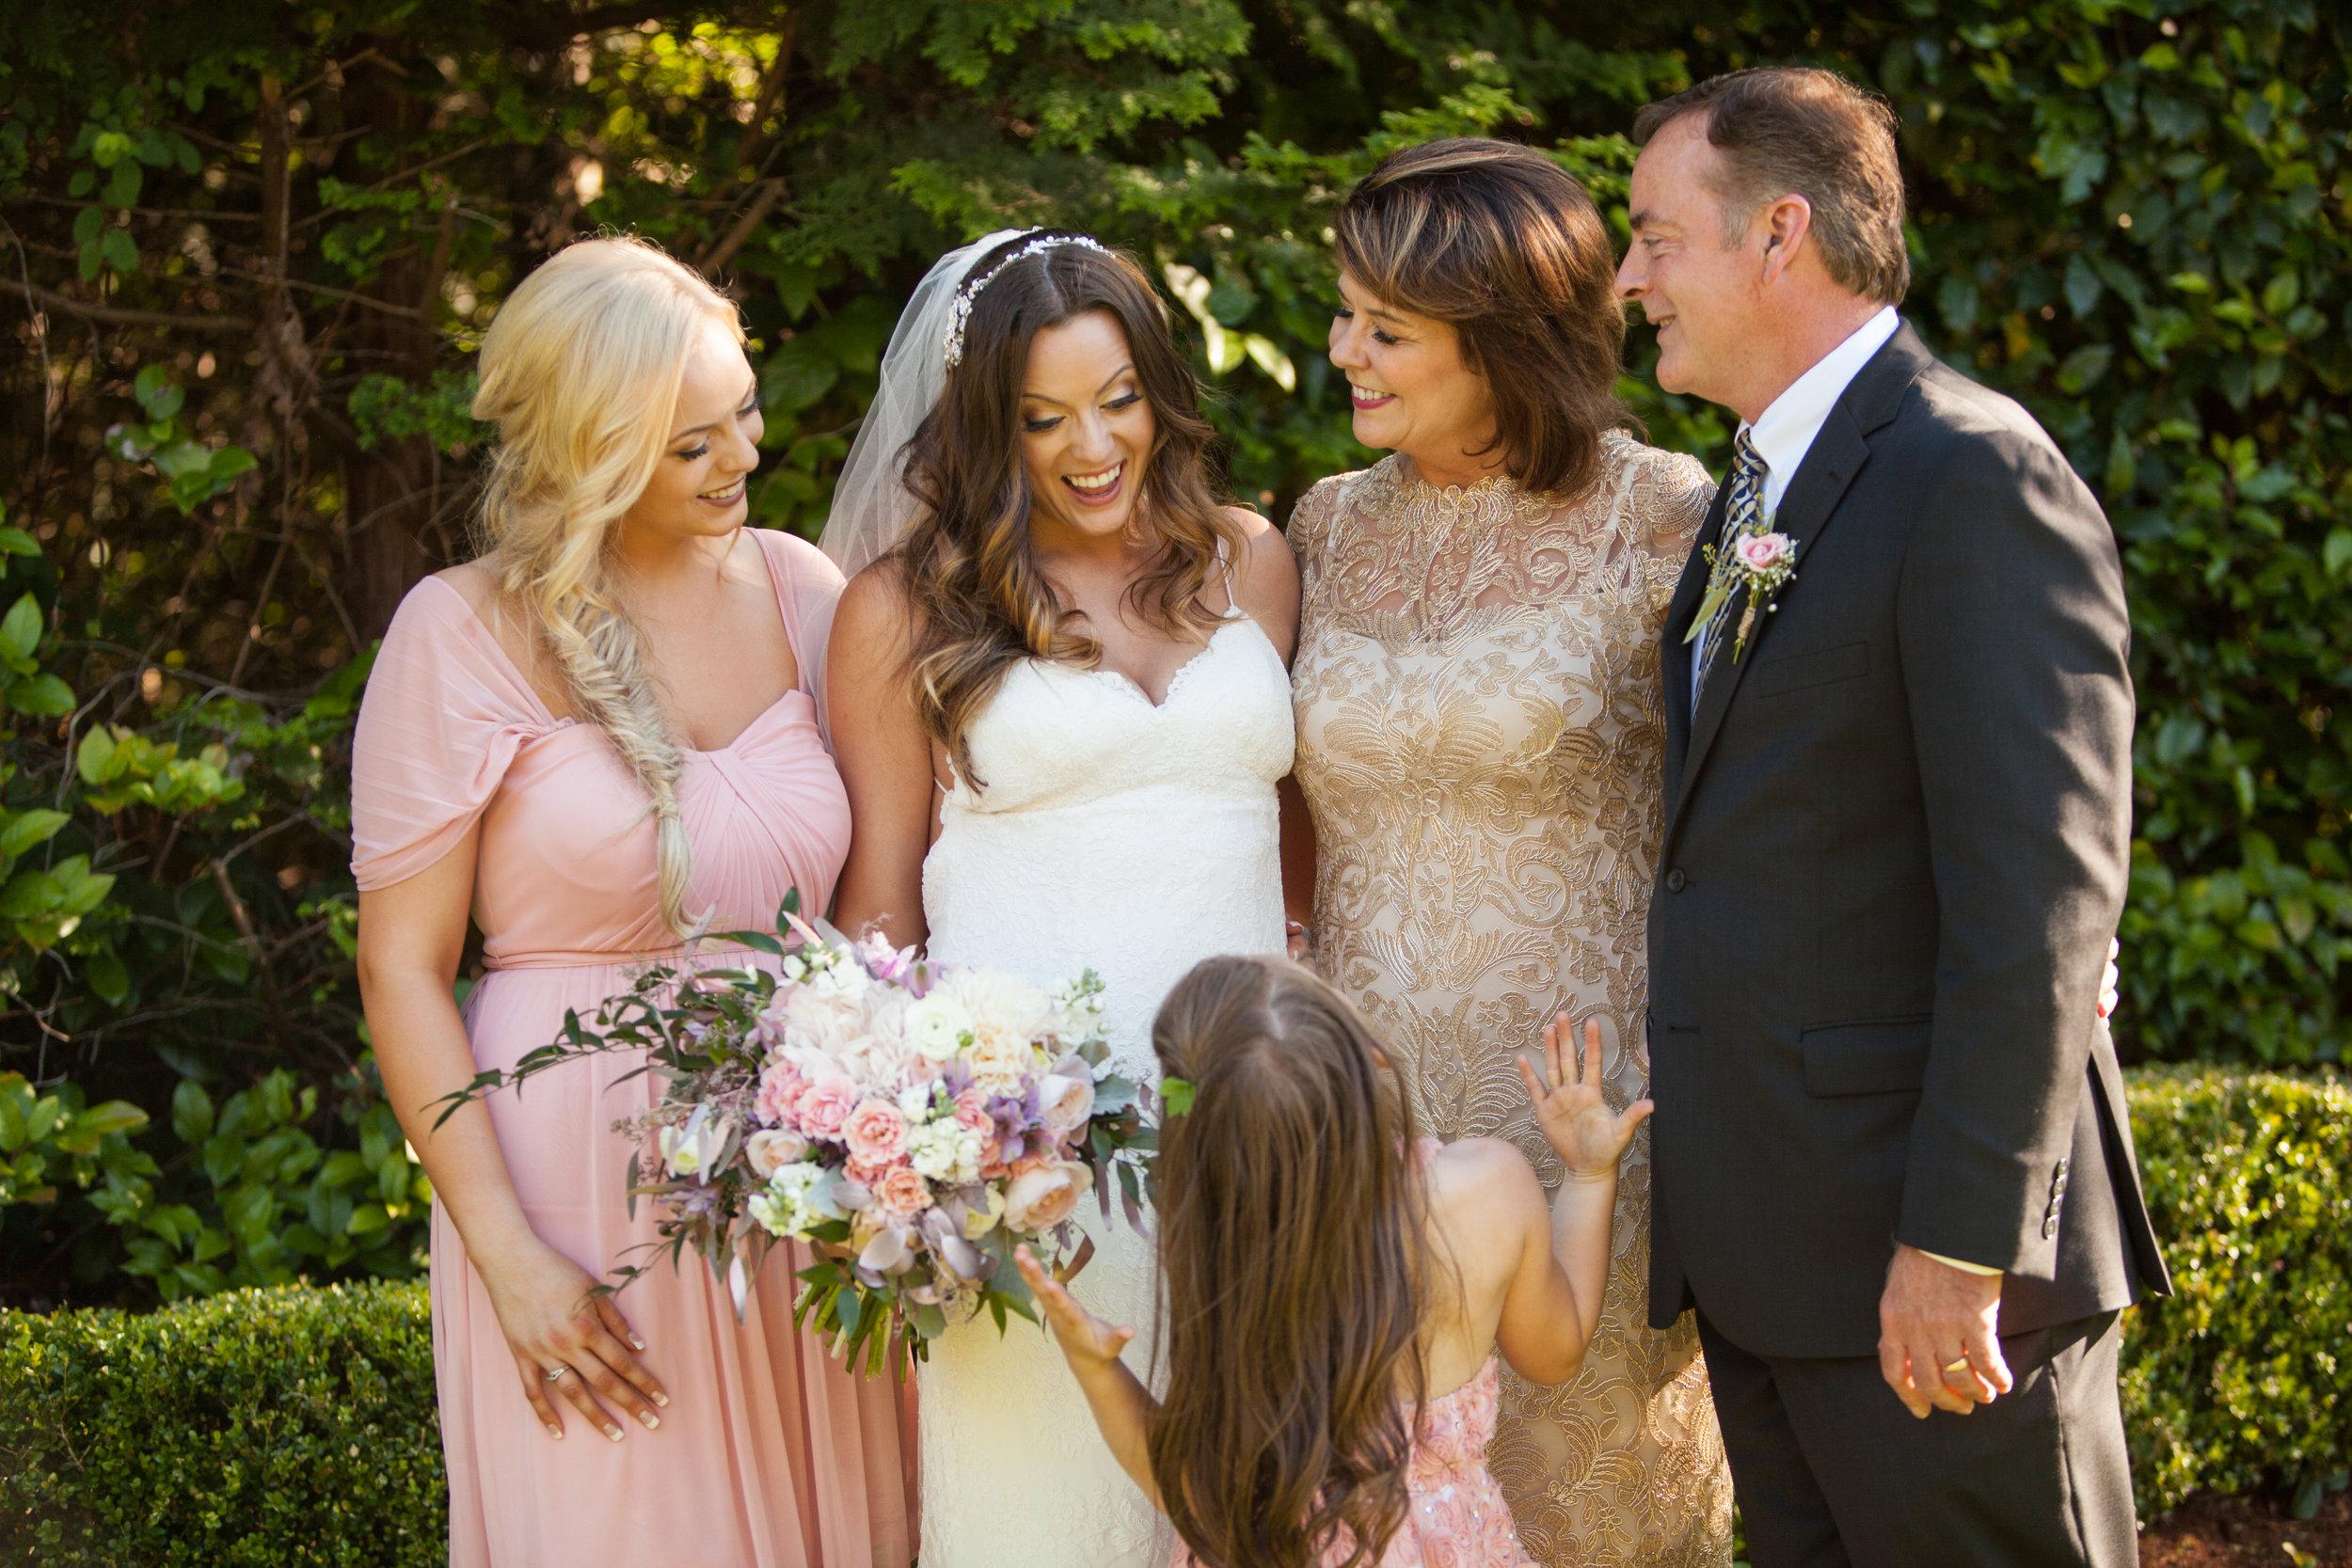 sandstrom_wedding_289.jpg